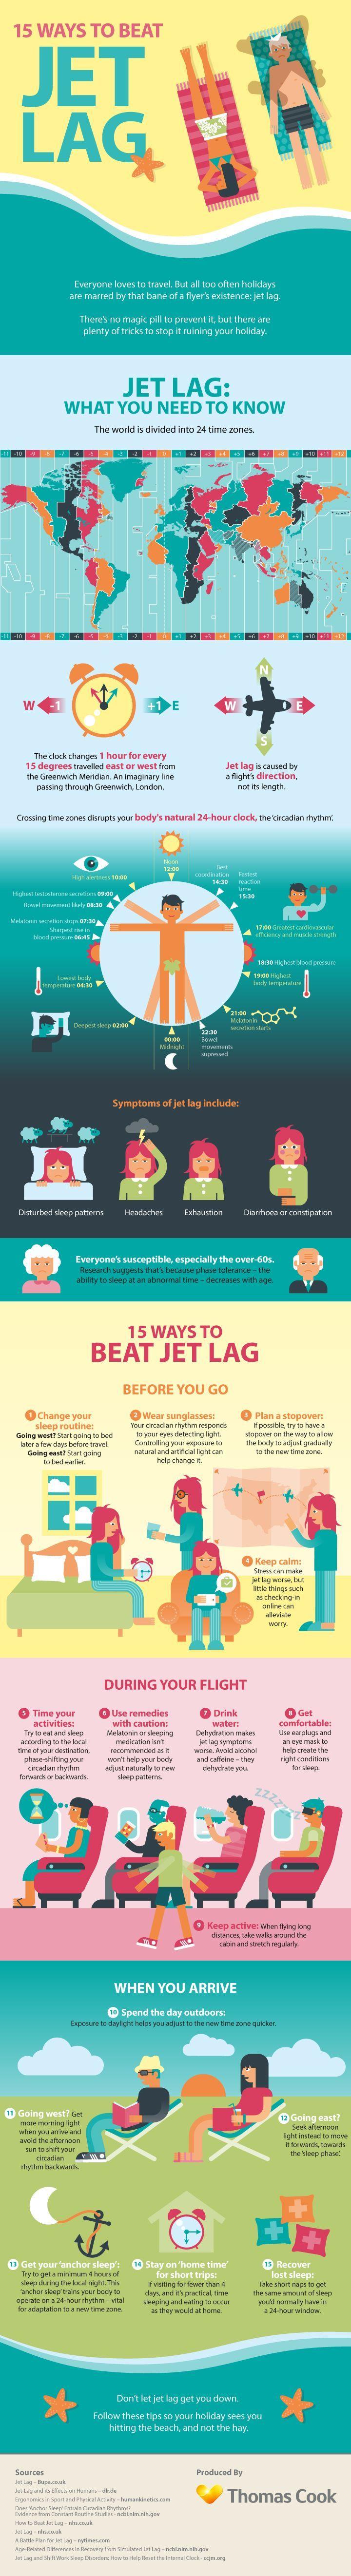 15 Ways To Beat Jet Lag Infographic Packing Tips For Travel Jet Lag Travel Tips